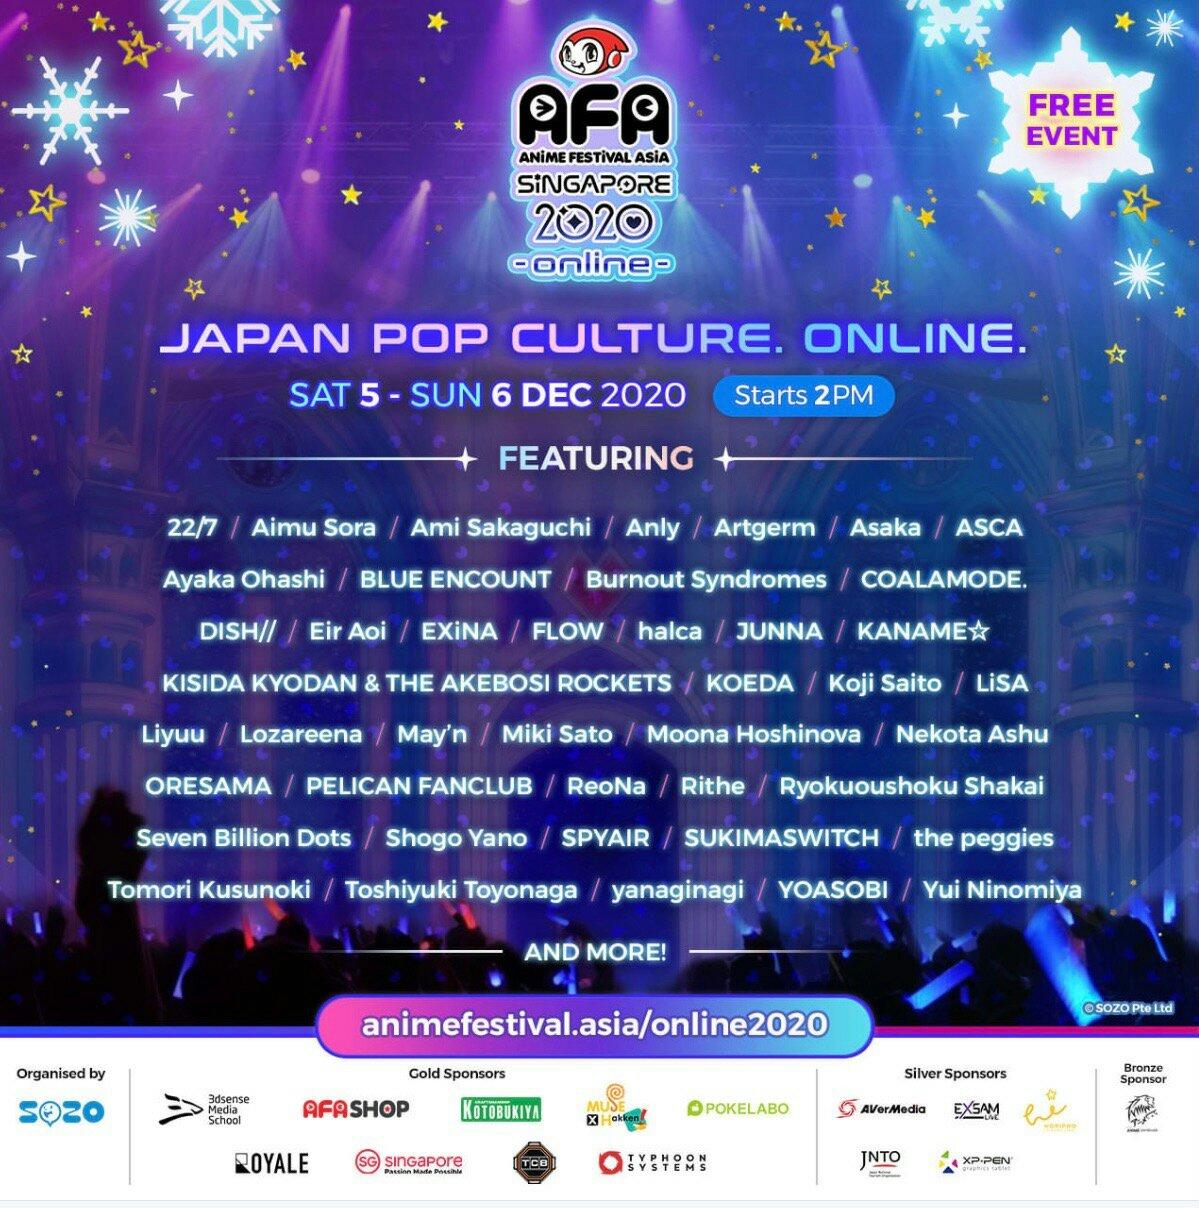 Anime Festival Asia - Singapore 2020 LINE UP J-Pop Idol & Puluhan Konten Siap Gempur AFA Fans Dalam Format Online! 4